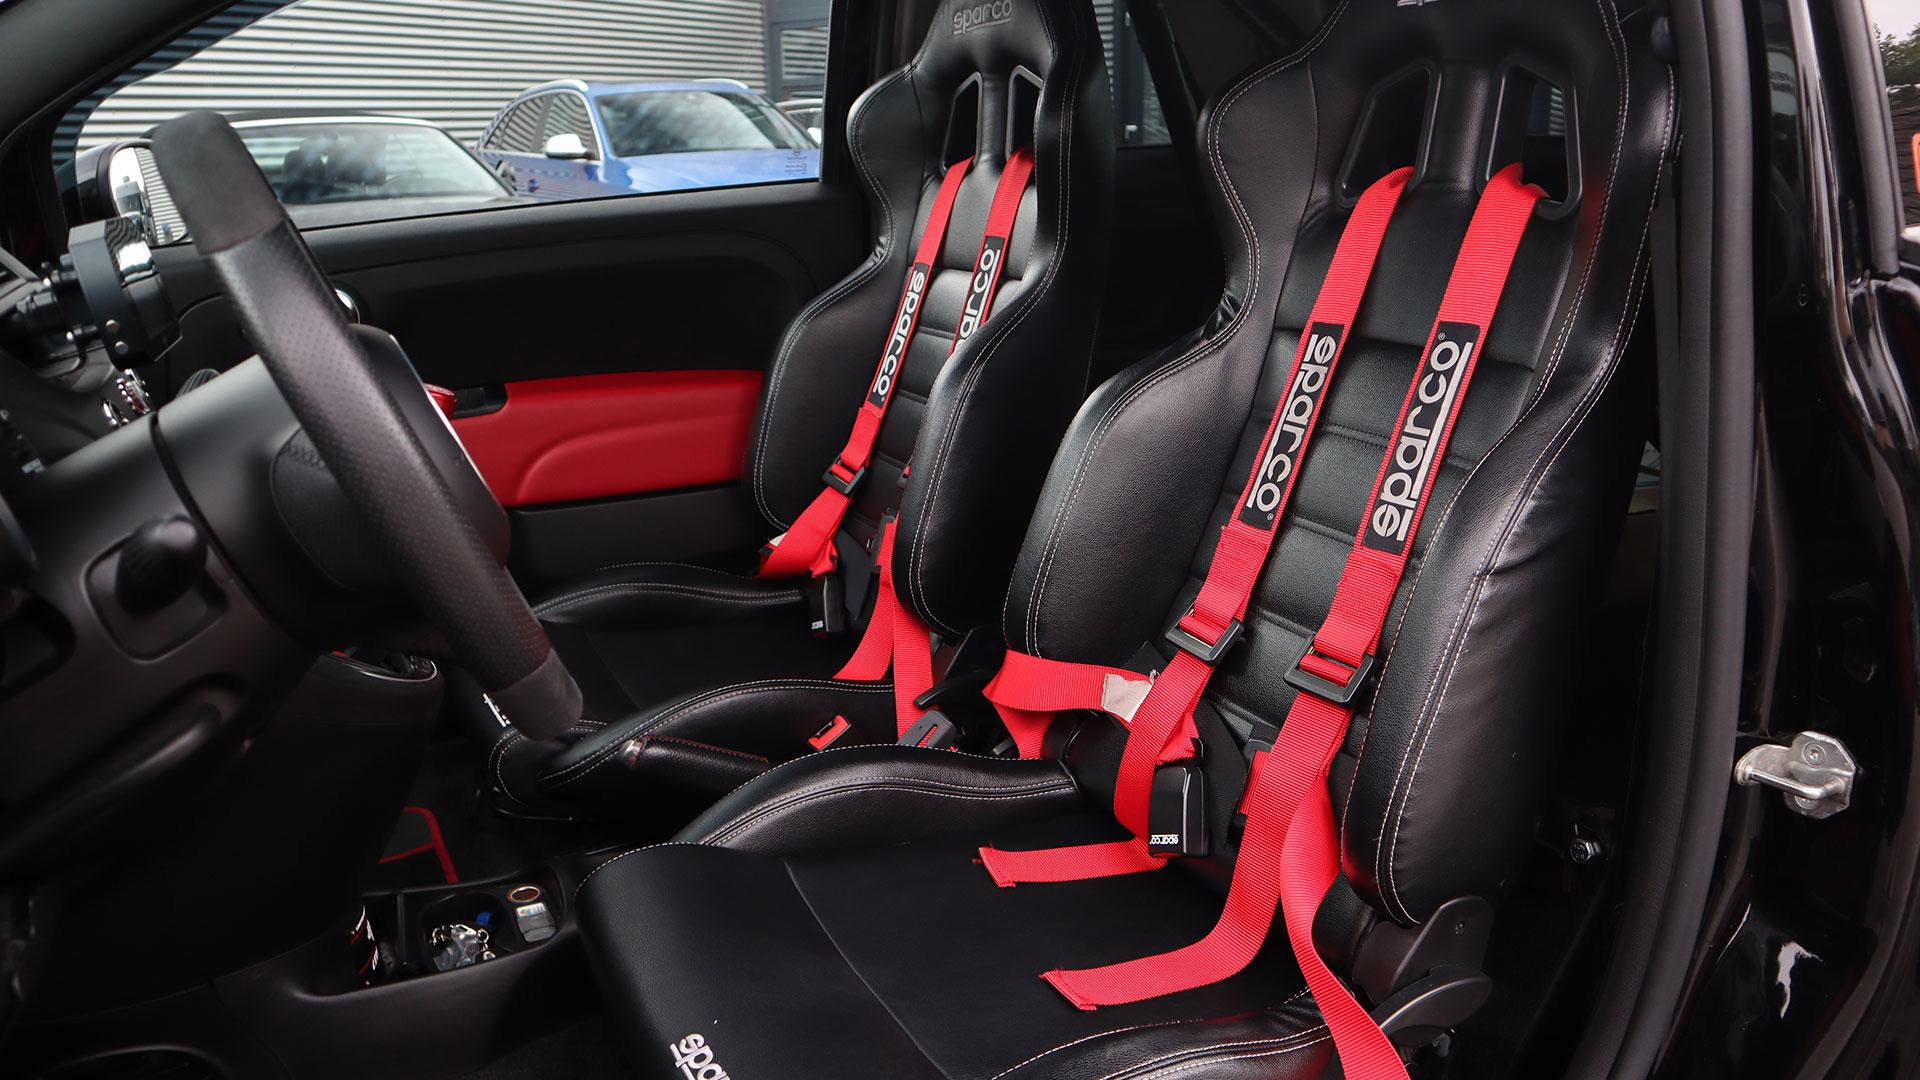 Gordels Fiat 500 Abarth met 500 pk